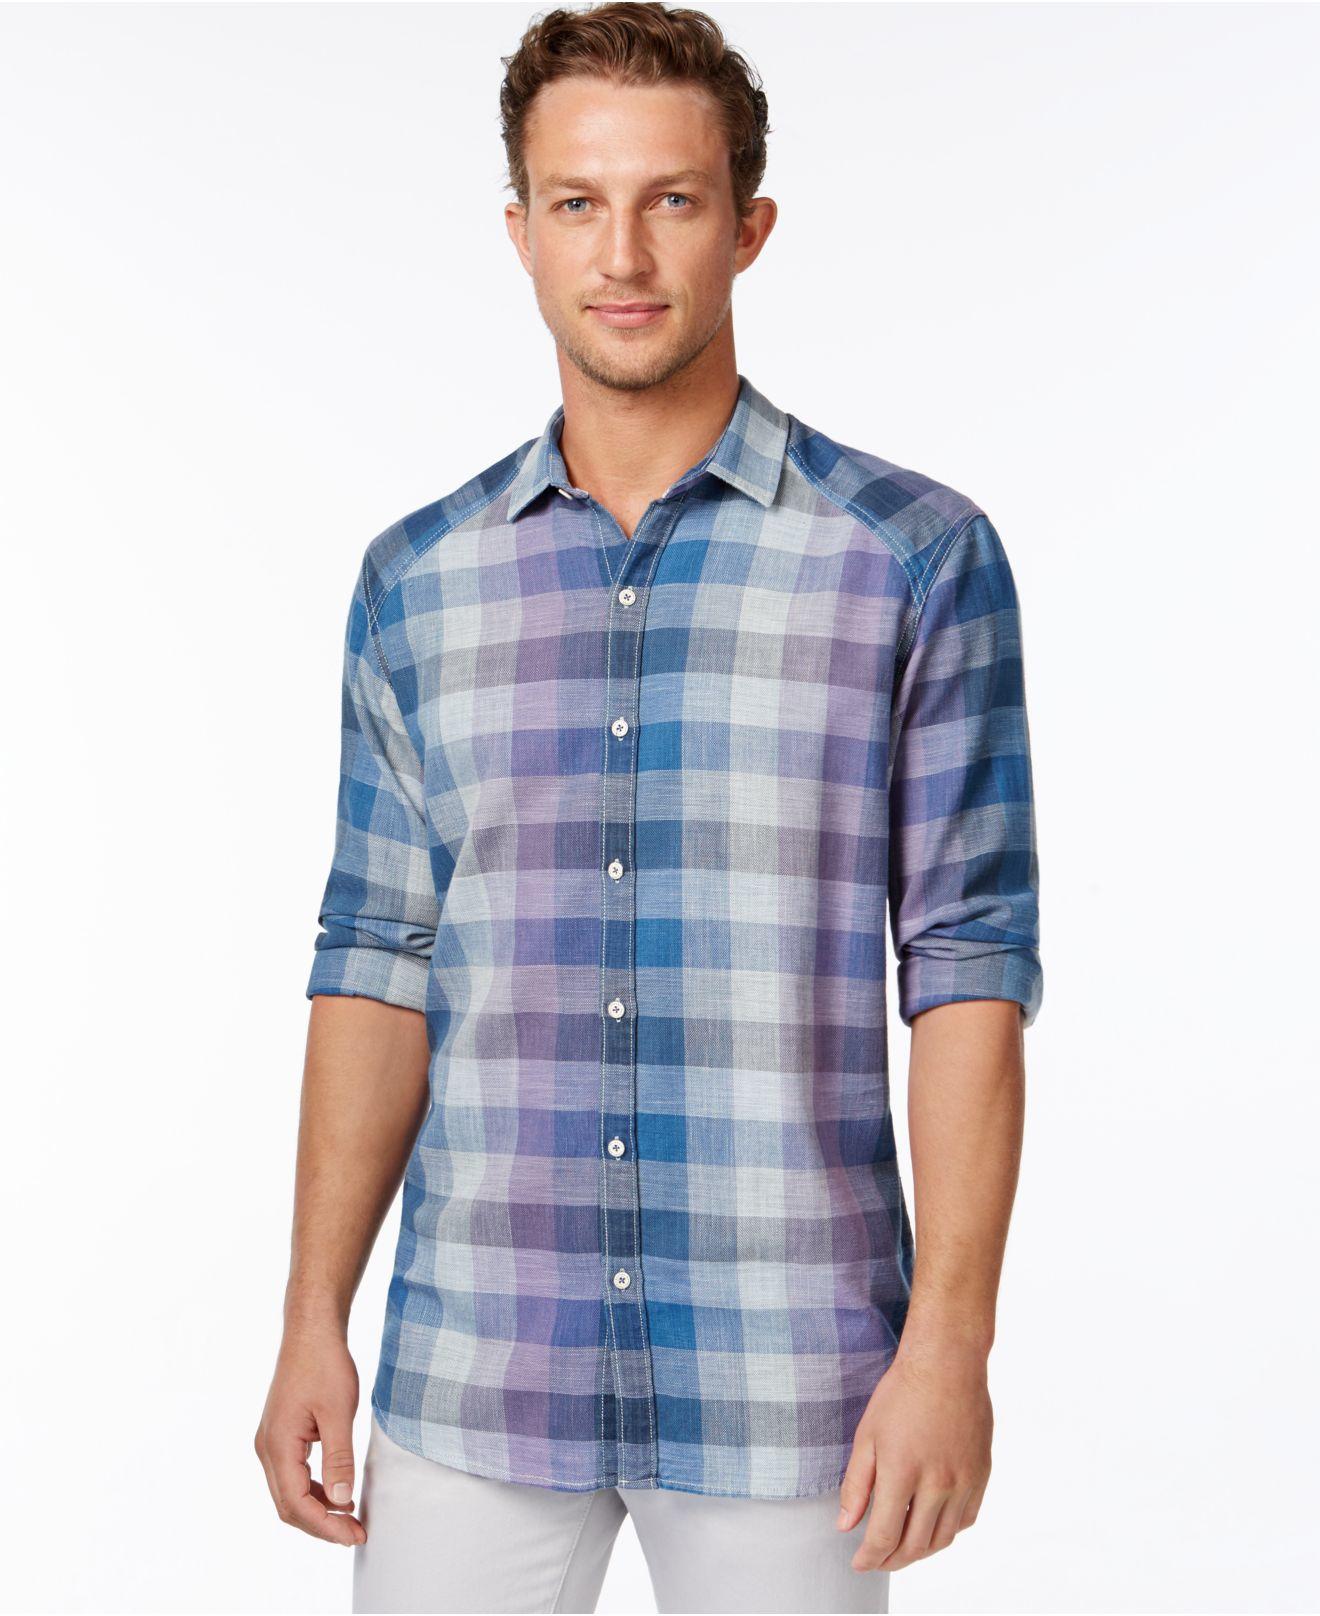 Lyst tommy bahama gingham coast long sleeve shirt in for Tommy bahama long sleeve dress shirts